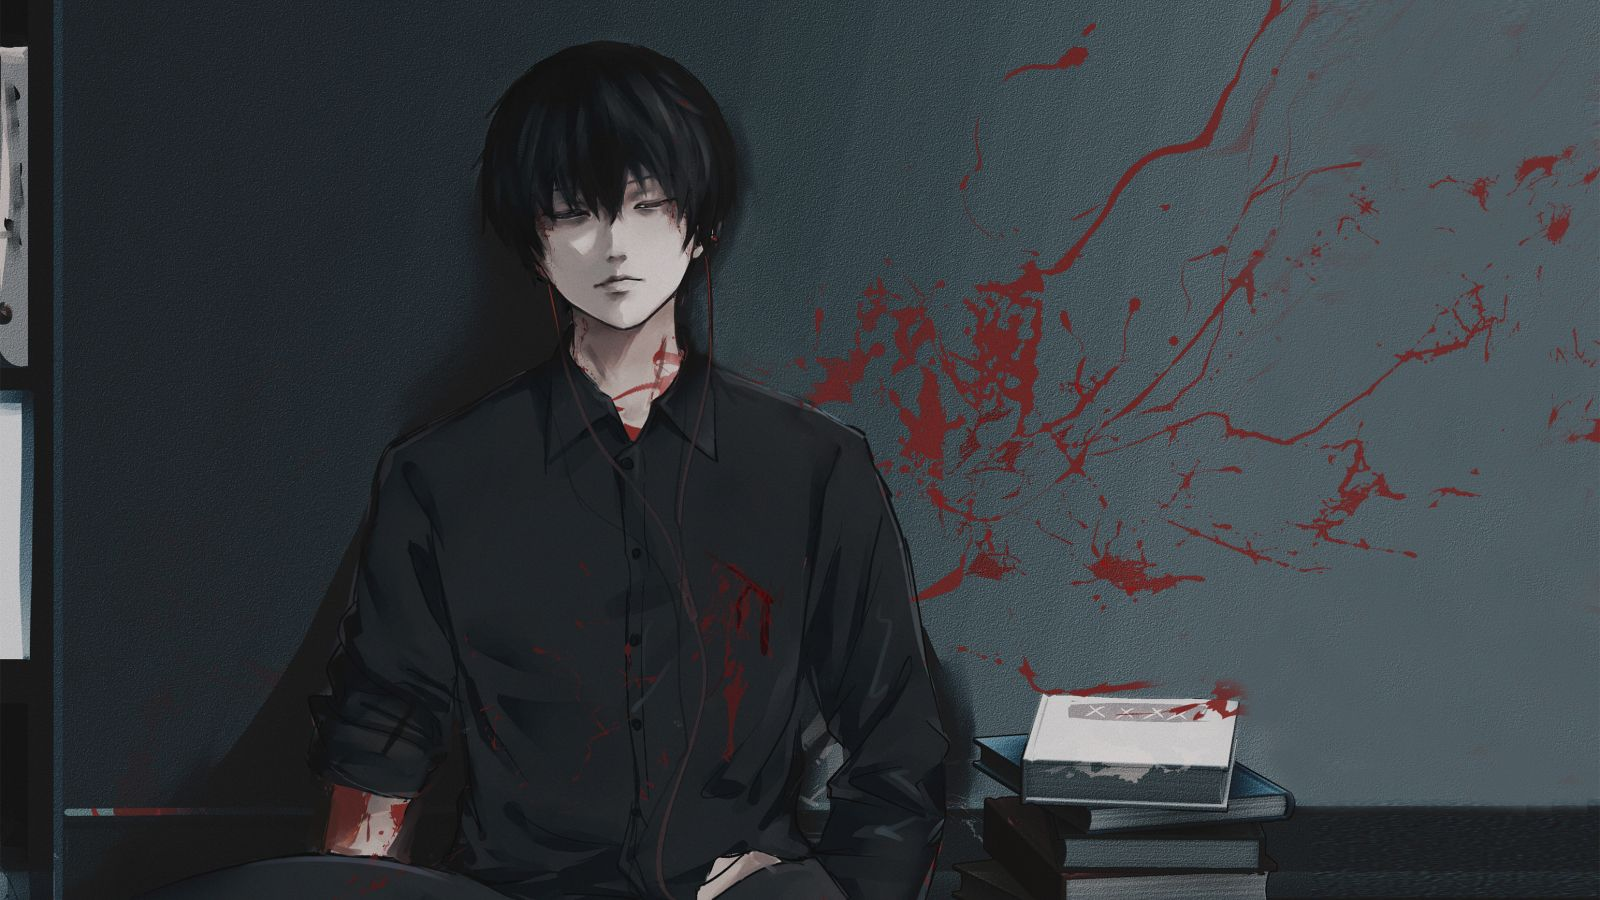 Sad Kaneki Anime Wallpapers Wallpaper Cave